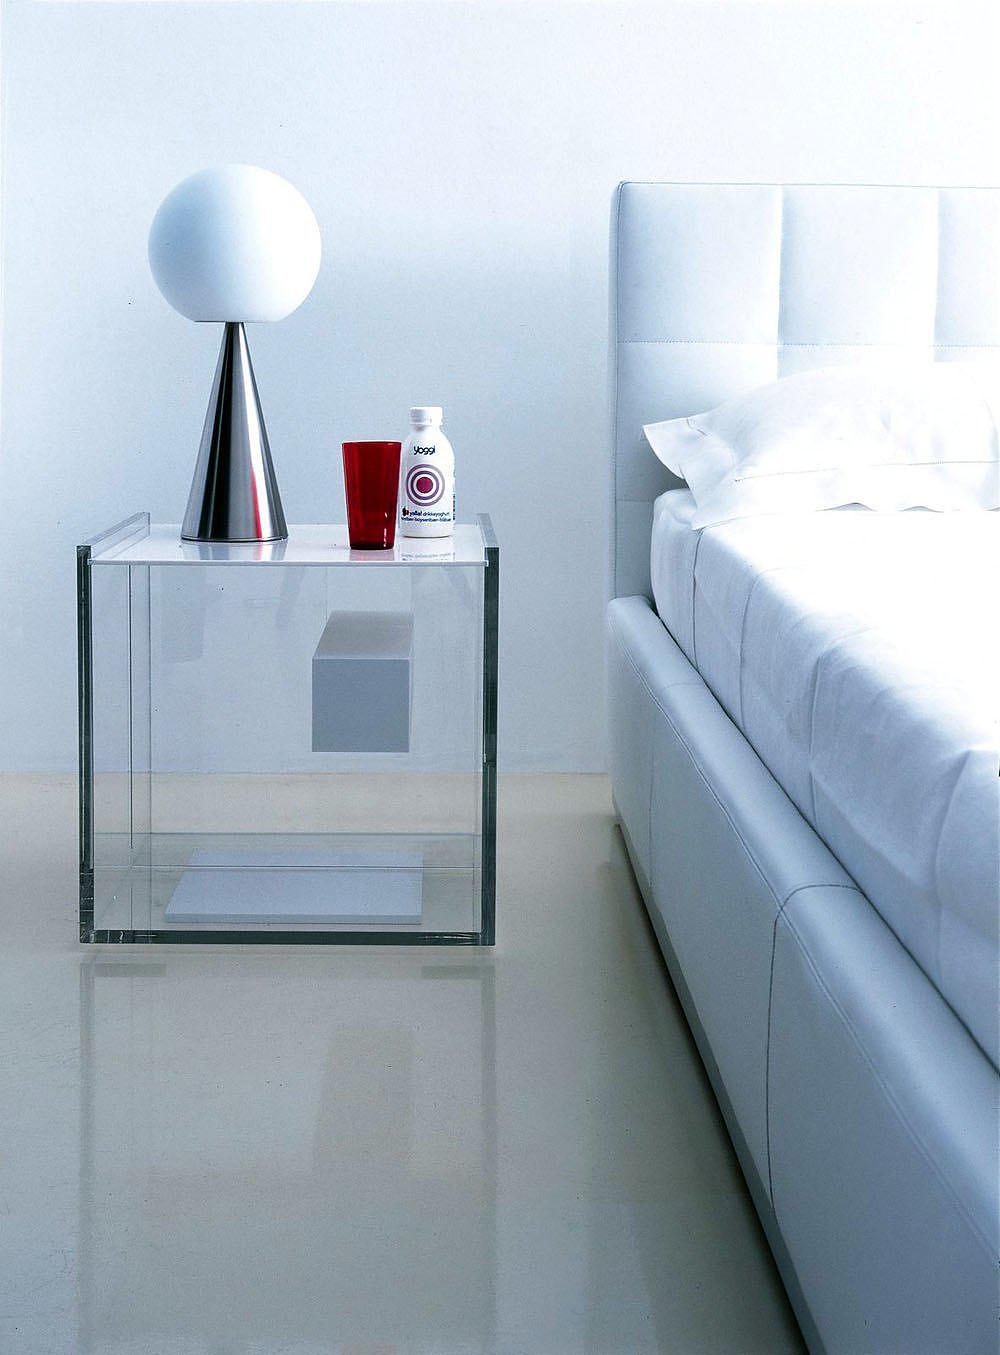 Zanotta Segreto Night Table: Futuristic yet Timeless.